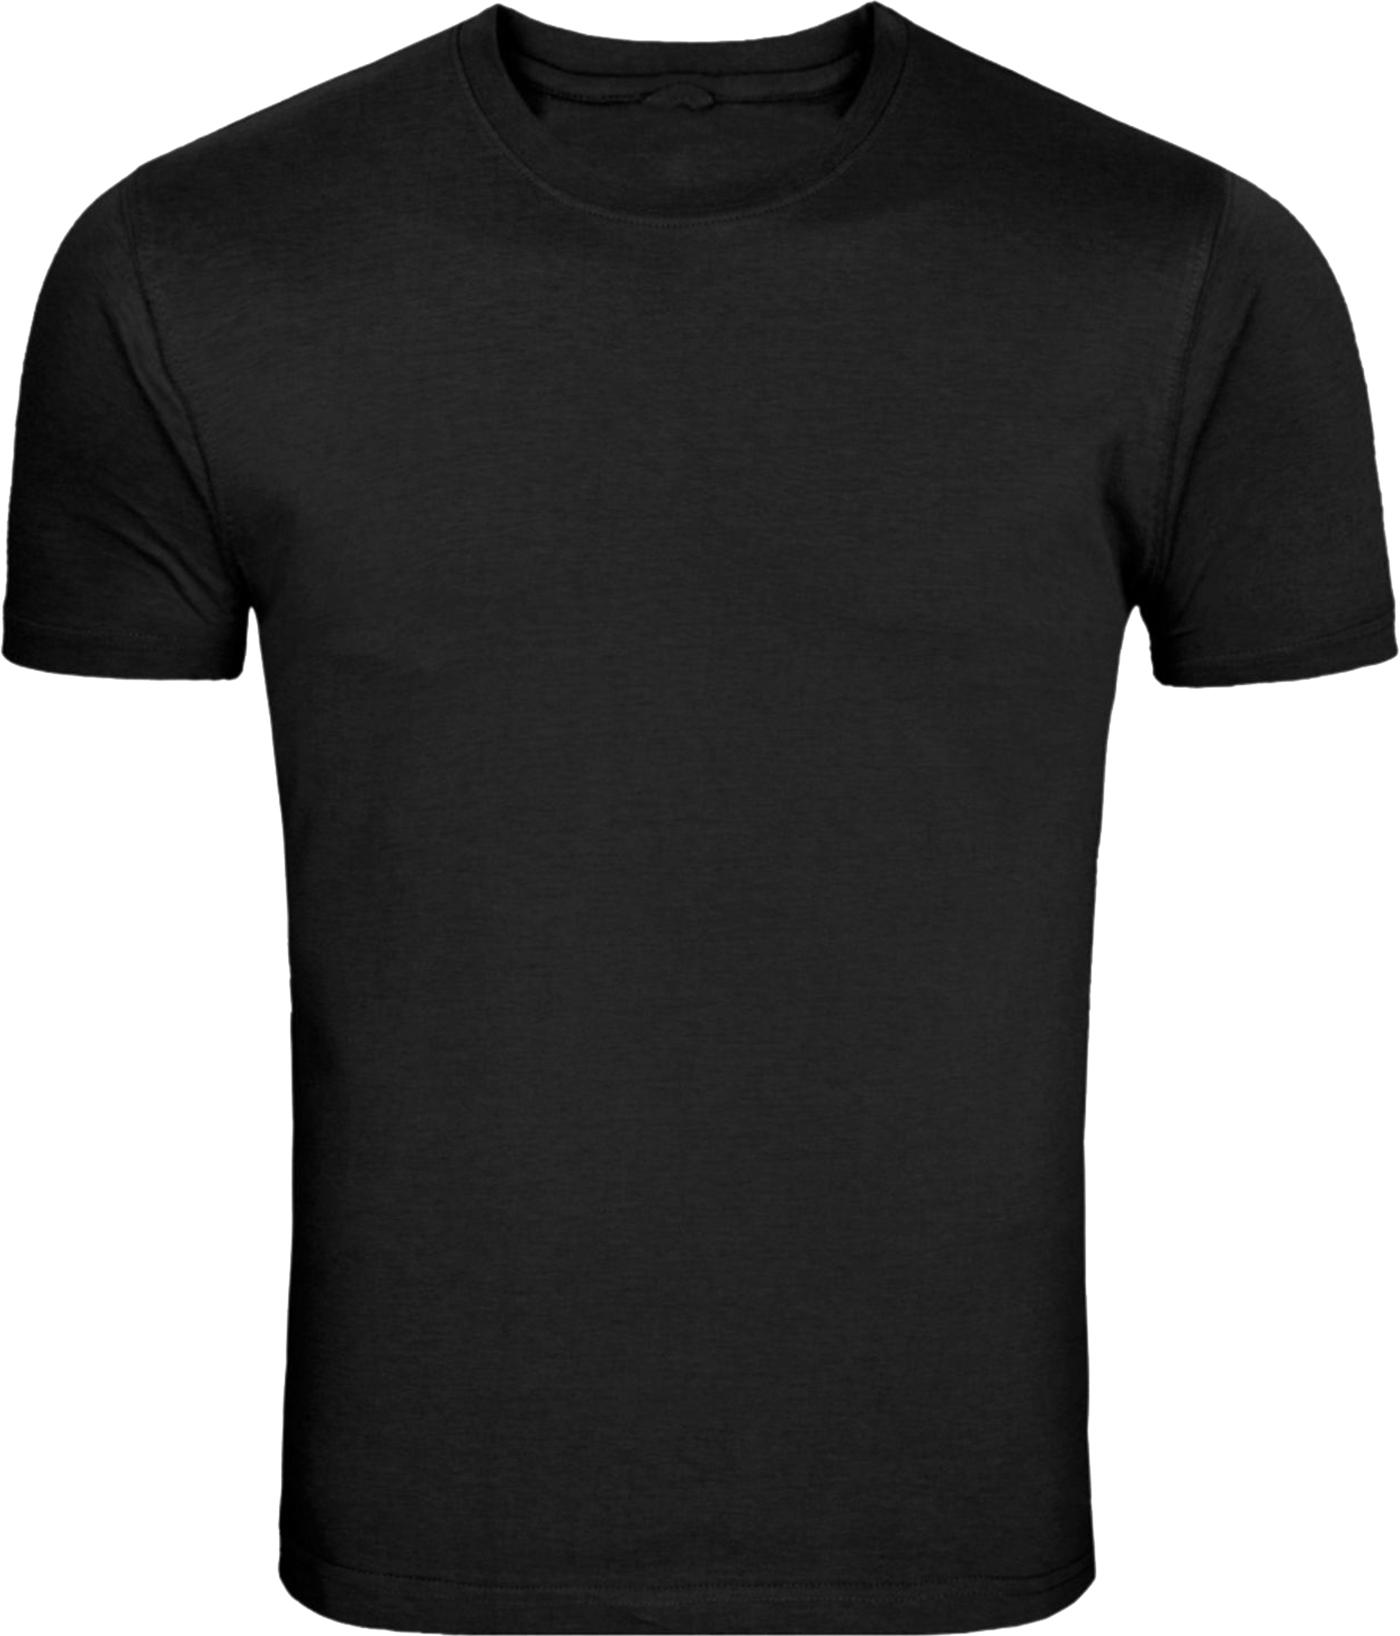 Black t shirt sports - Pe Sports Short Sleeve Crew T Shirts Only